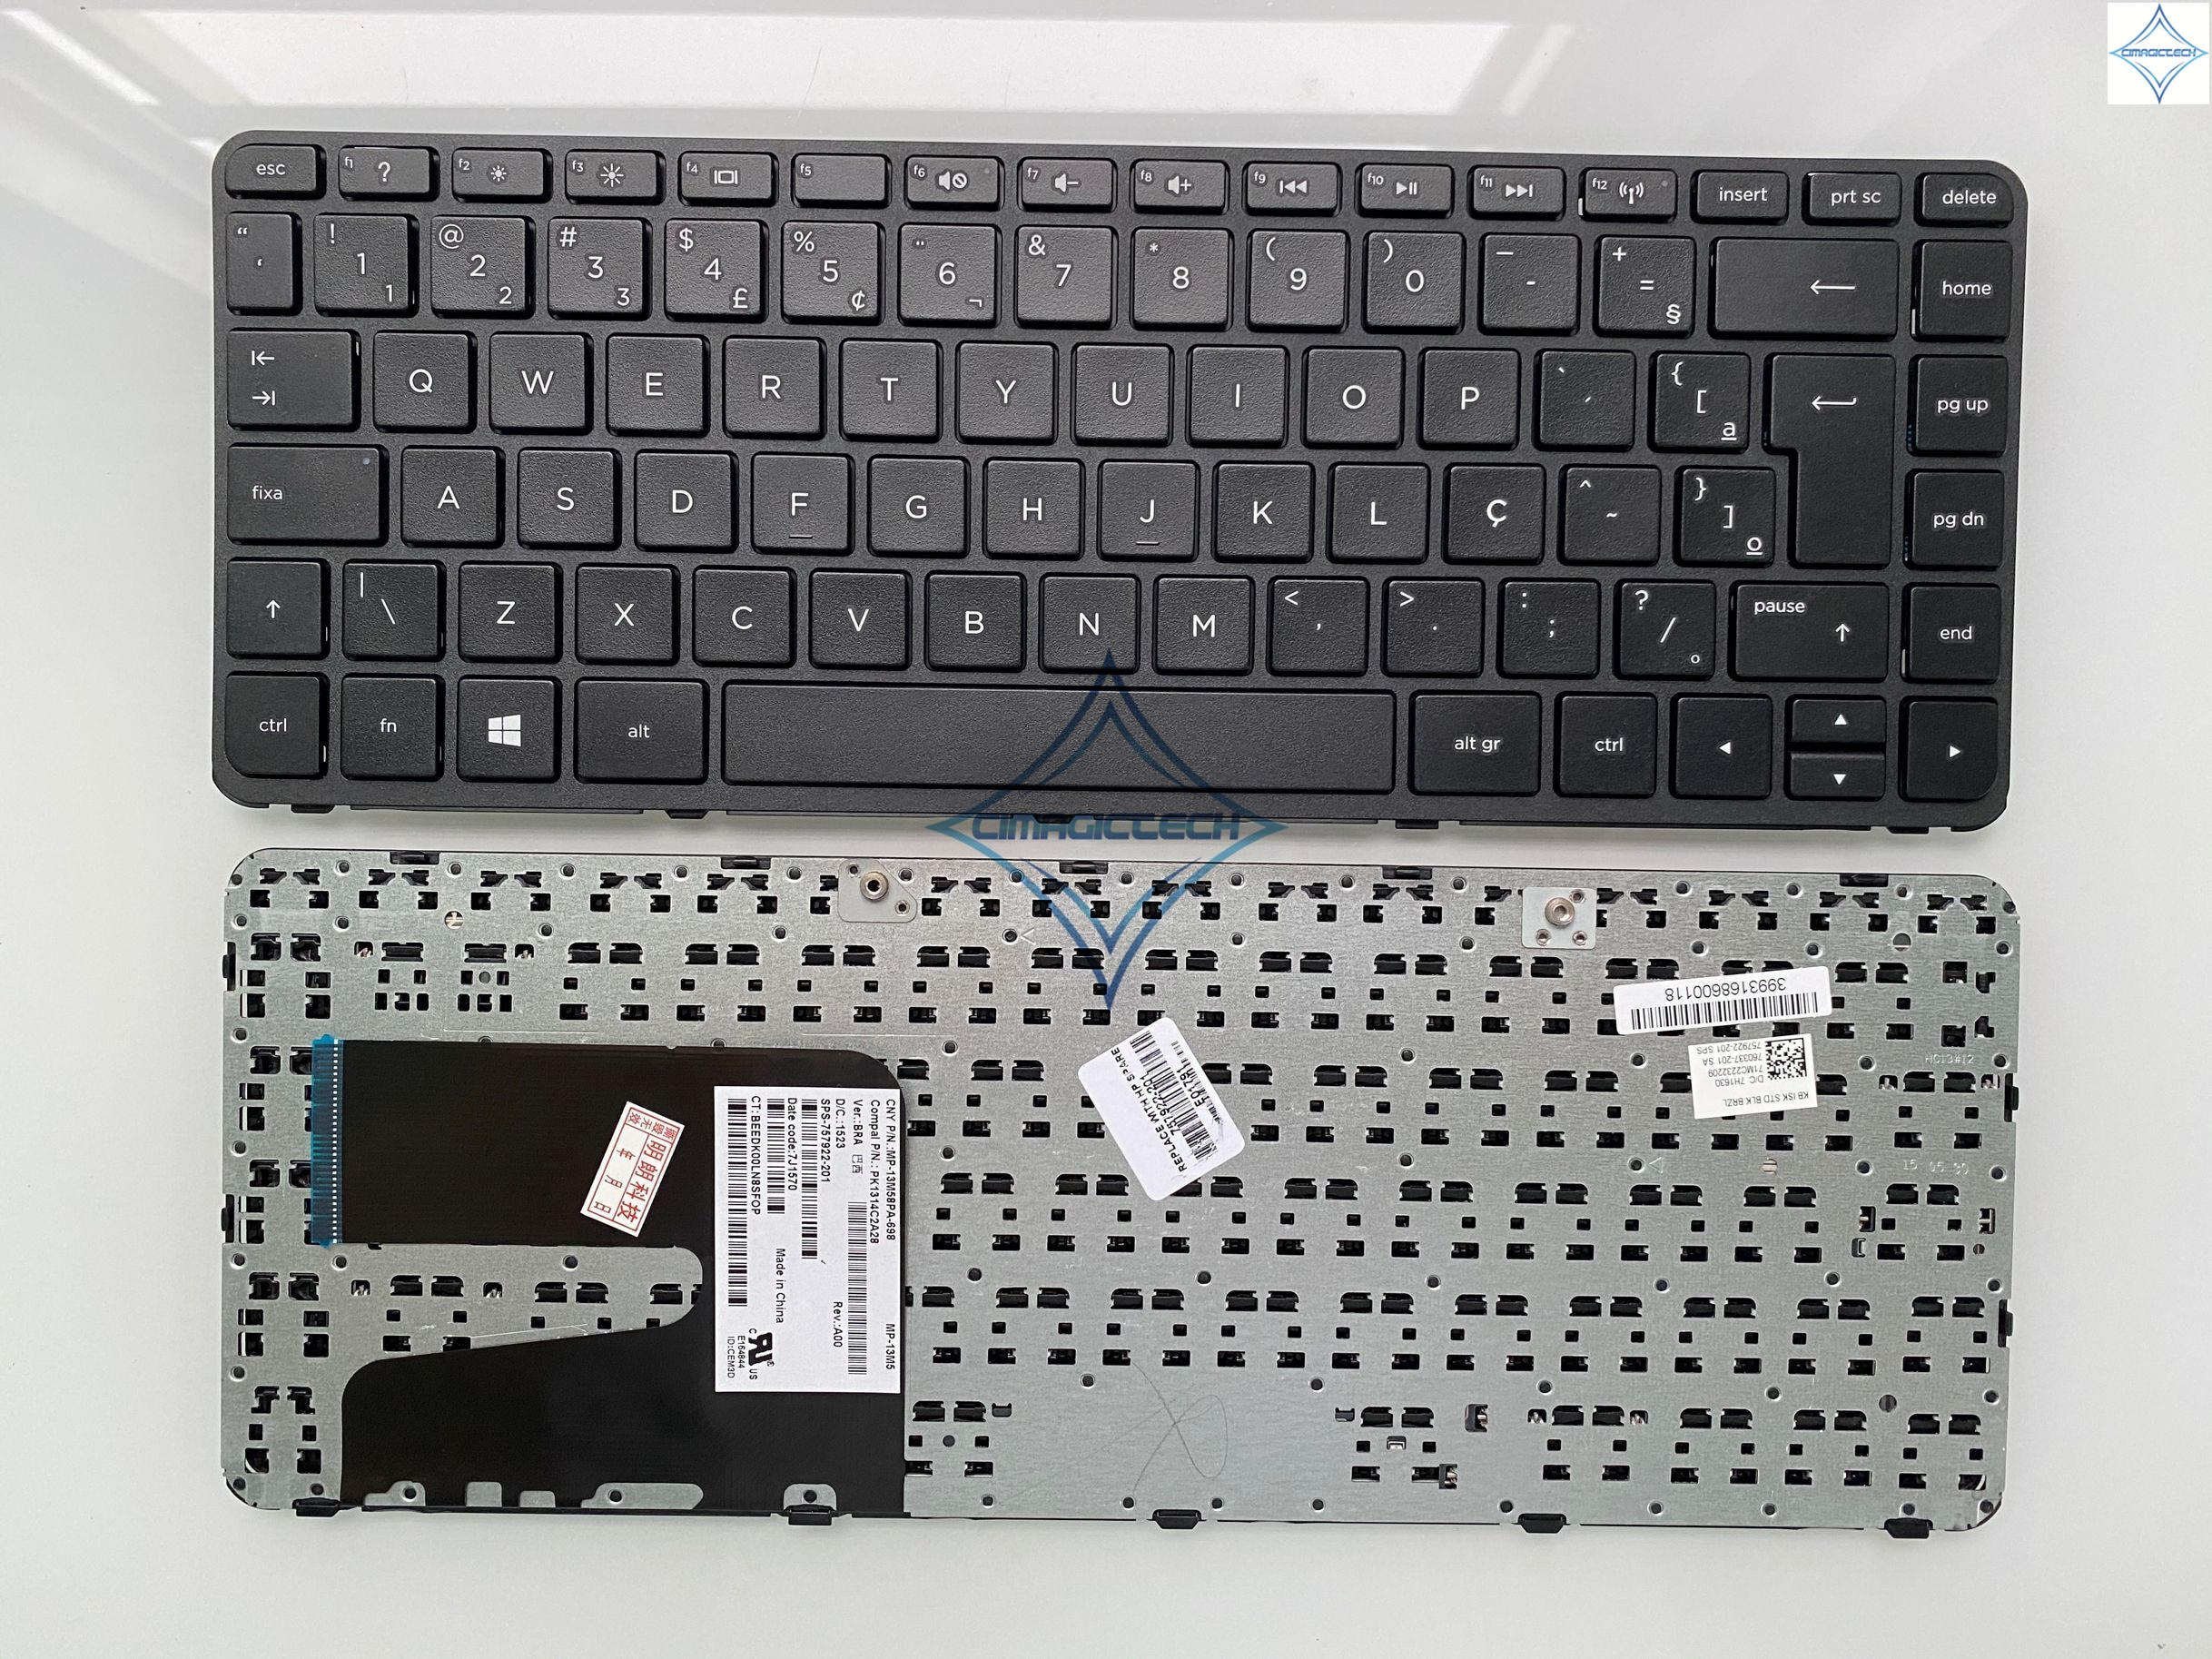 Nouveau pour HP 240 G2 245 G3 14-N 14-R 14-D 14-g000 14-r000 14-n000 14-w000 14-d000 br Brésil clavier dordinateur portable Portugais teclado